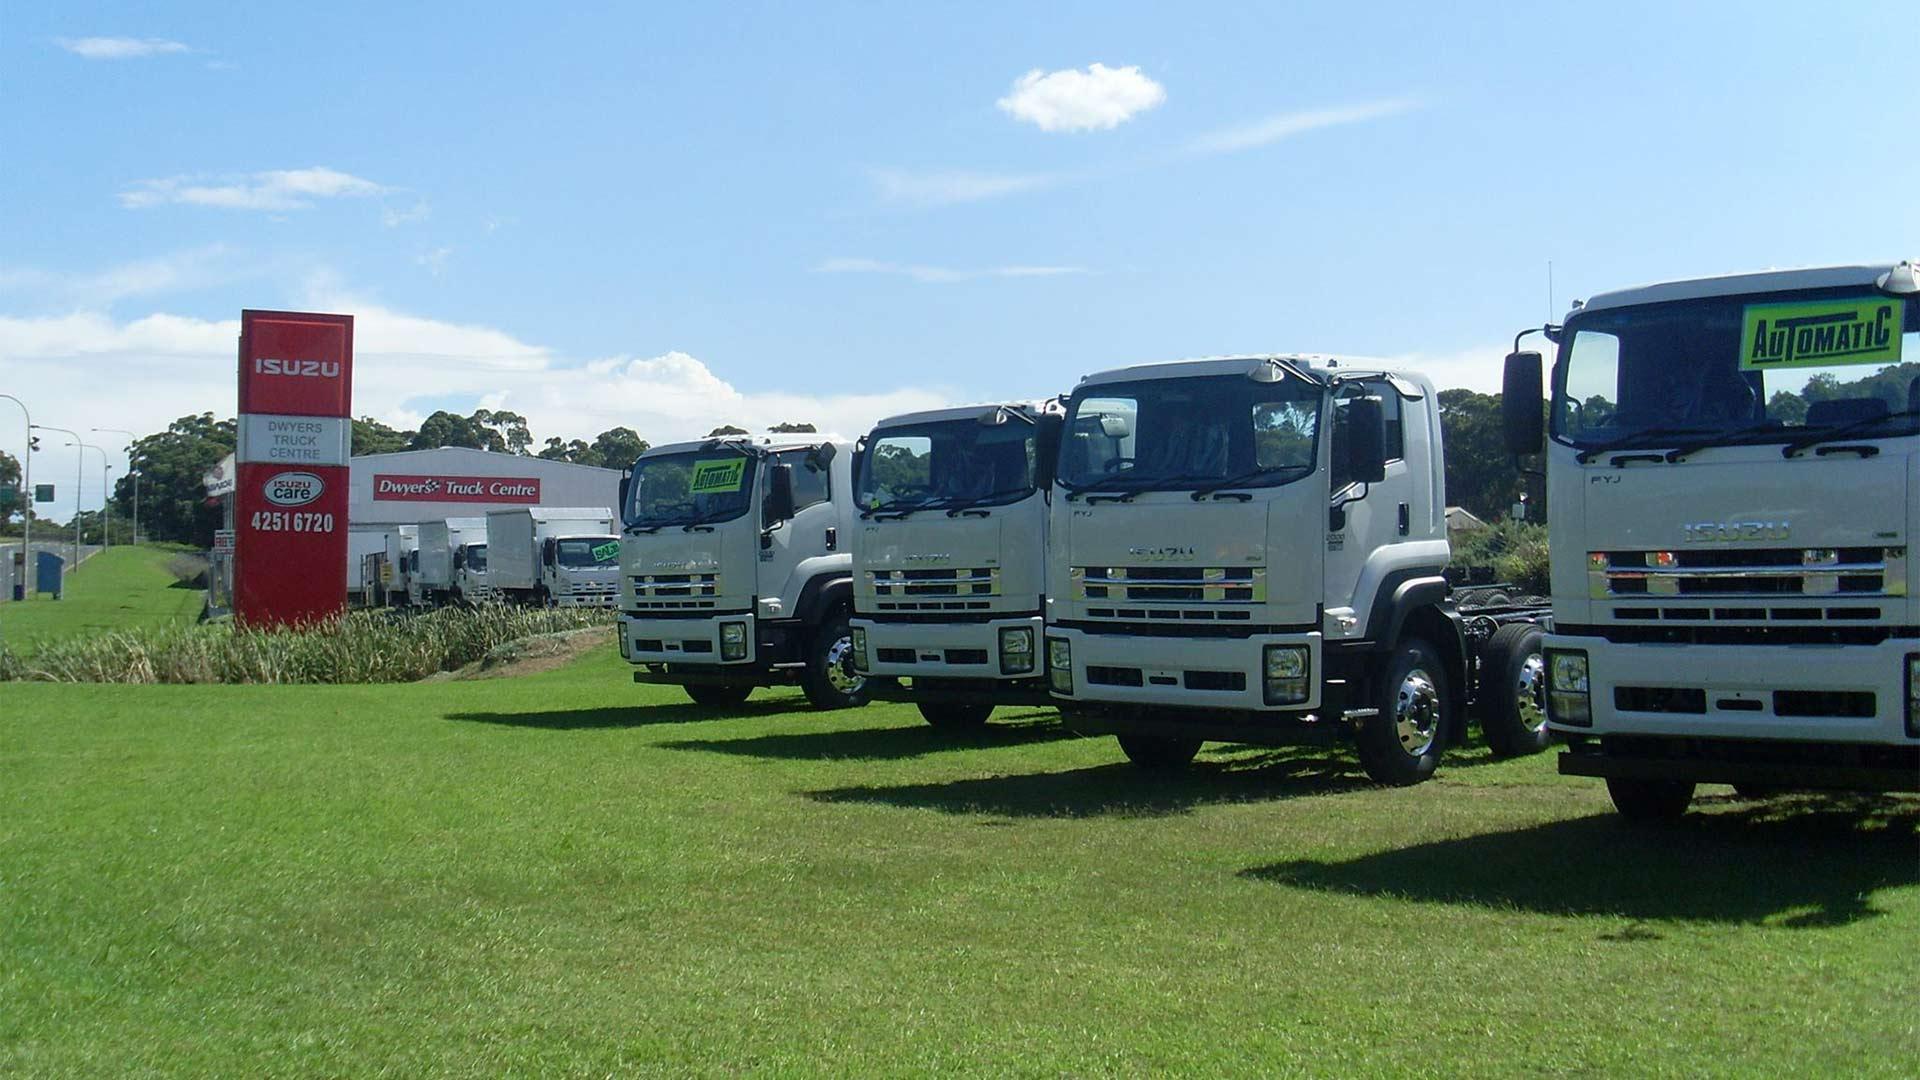 Dwyers Truck Centre